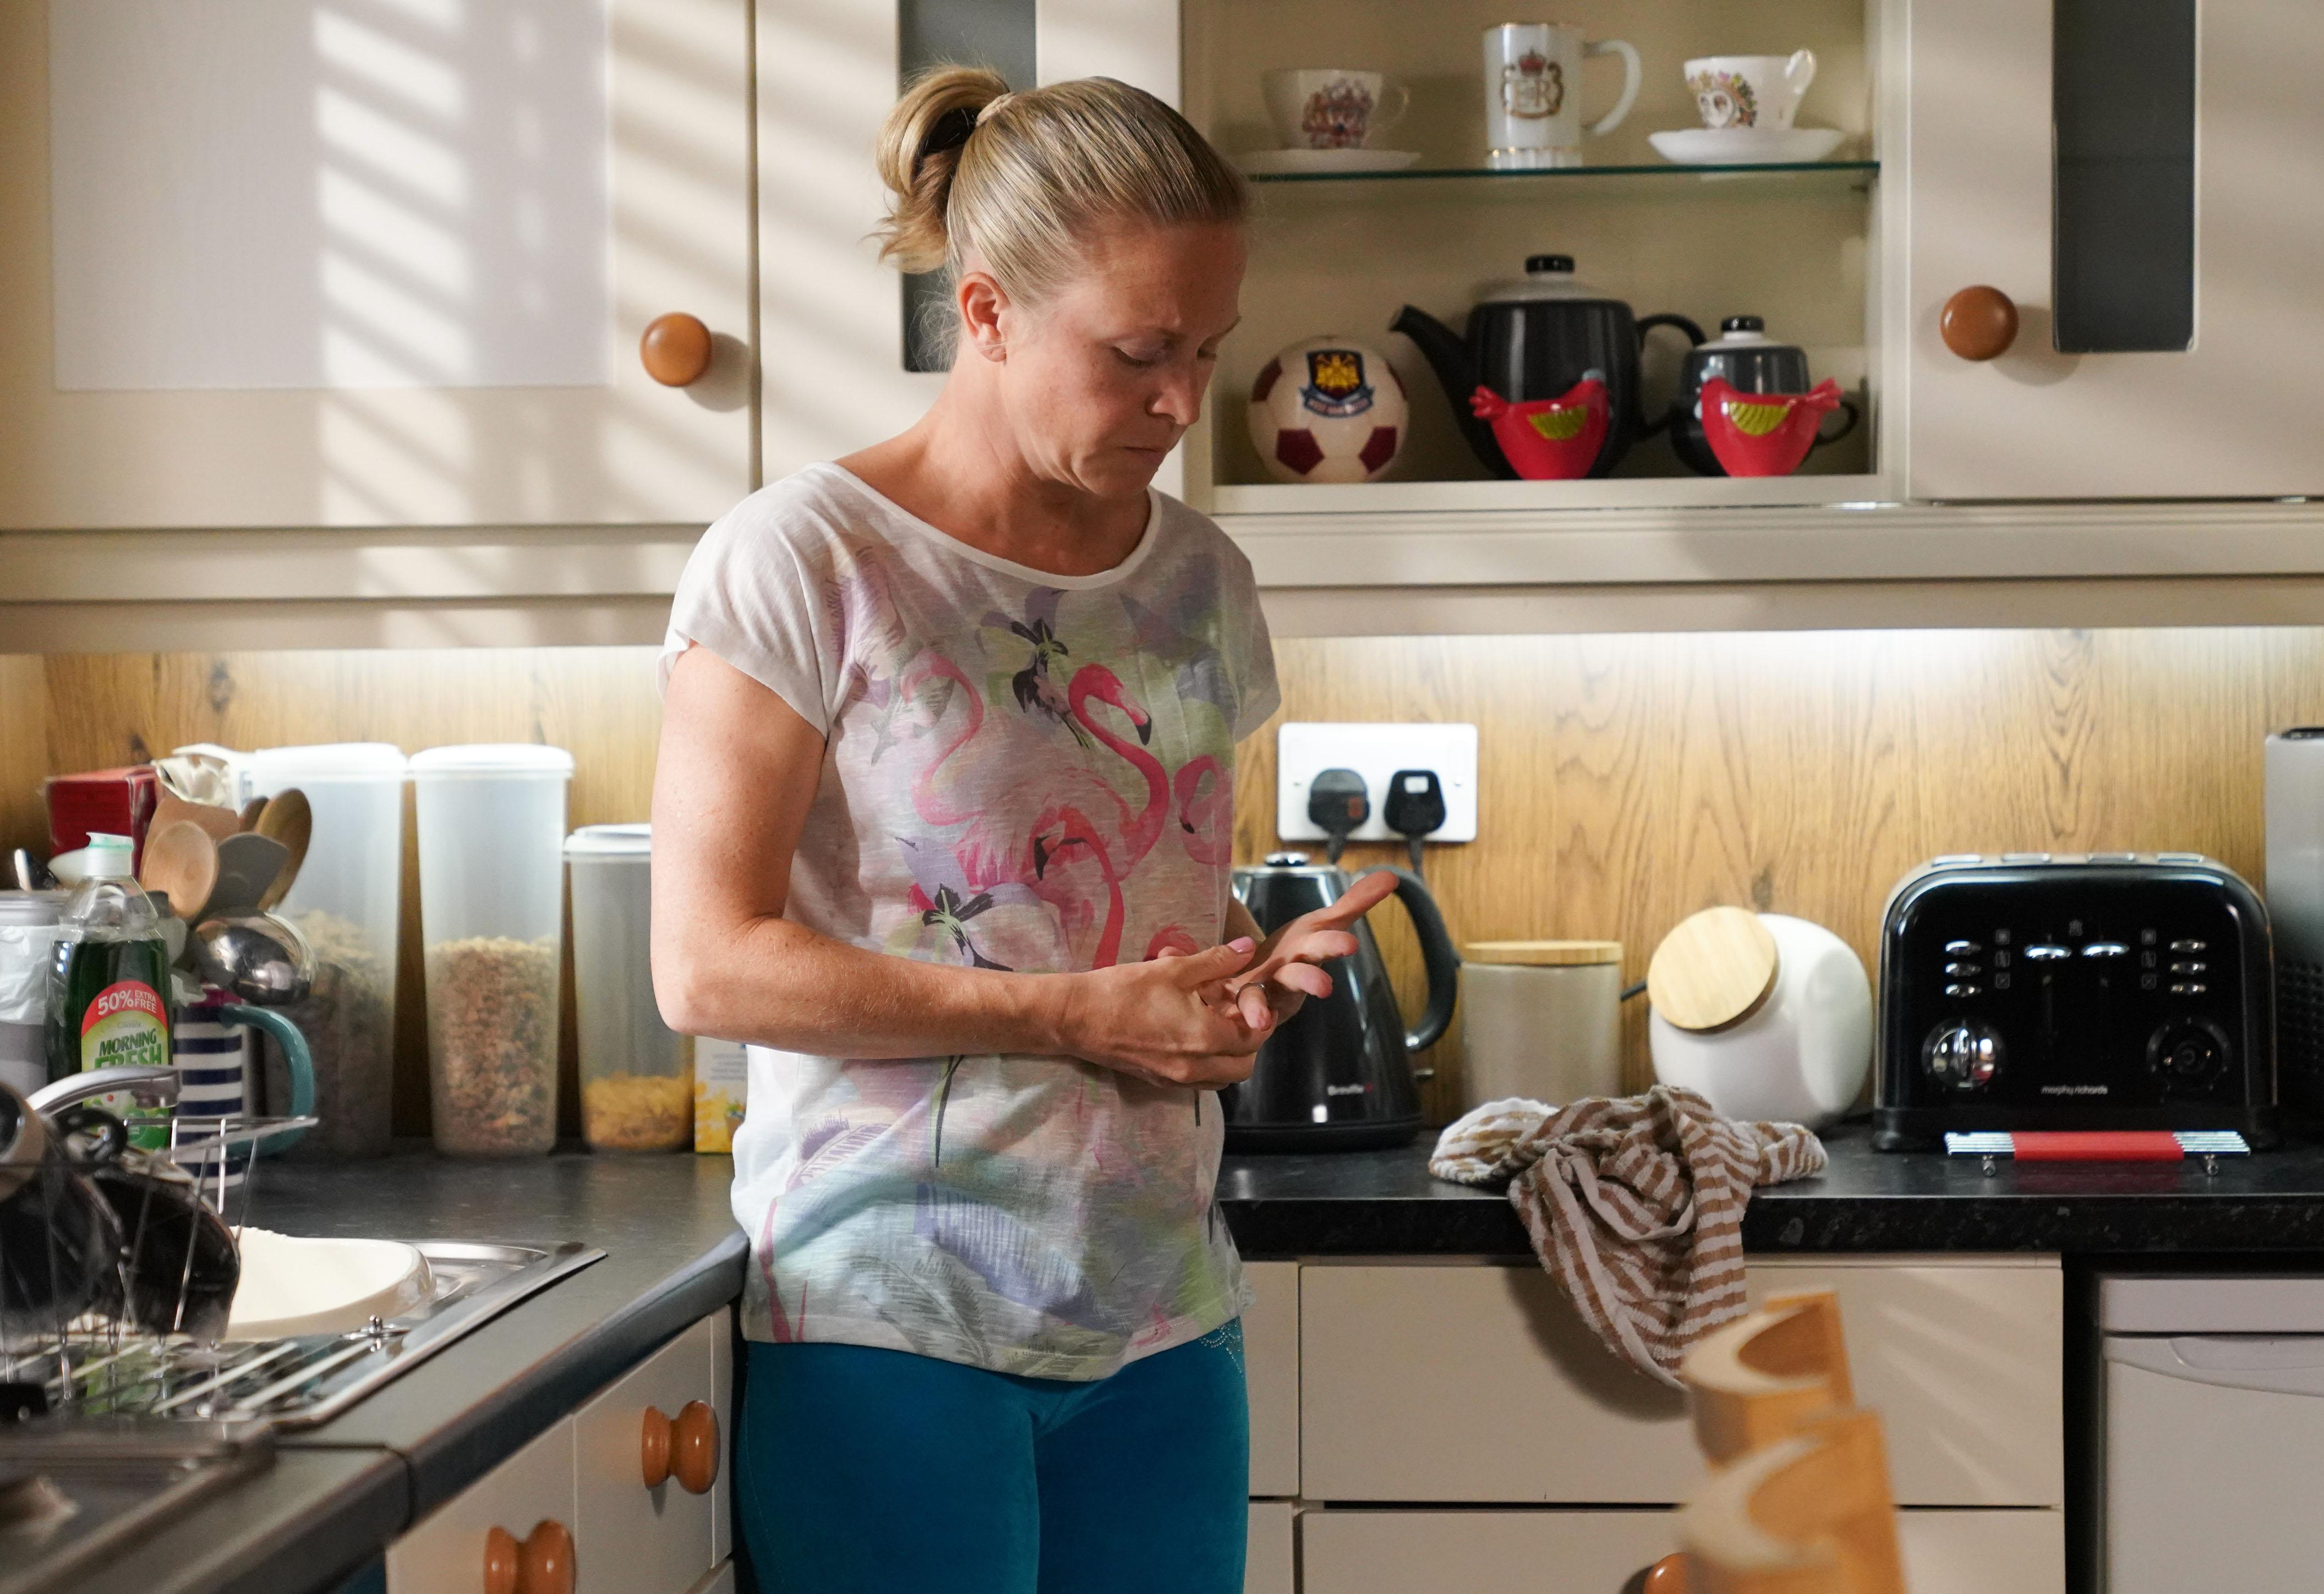 EastEnders spoilers: Linda Carter takes shocking action against jailed Mick